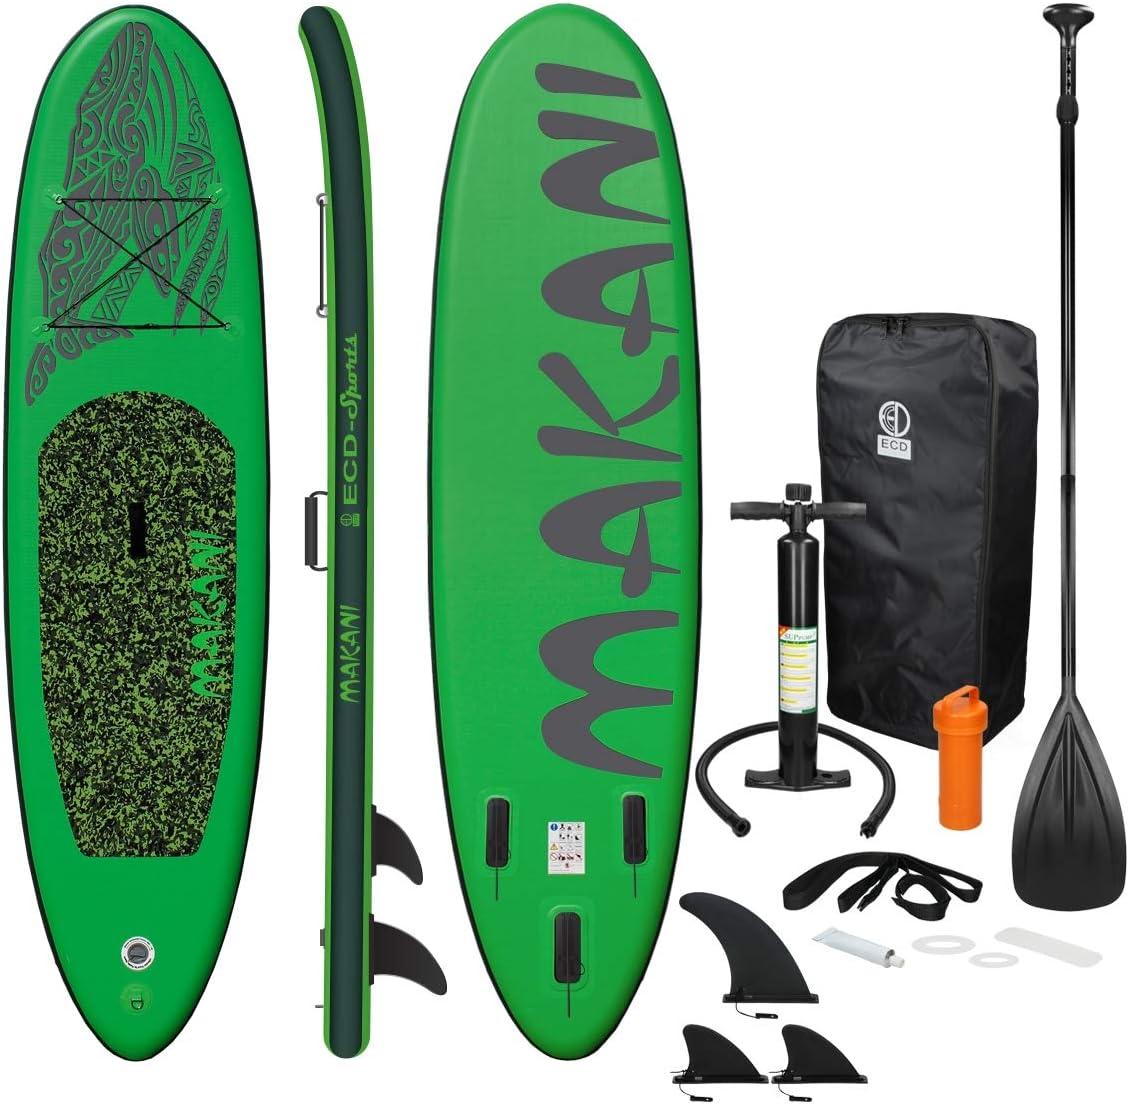 ECD Germany Tabla Hinchable Makani Paddle Surf/Sup 320 x 82 x 15 cm Verde Stand up Paddle Board PVC/EVA hasta 150kg 3 Antideslizantes Diferentes Modelos Incluye Paleta Aluminio Bomba y Accesorios